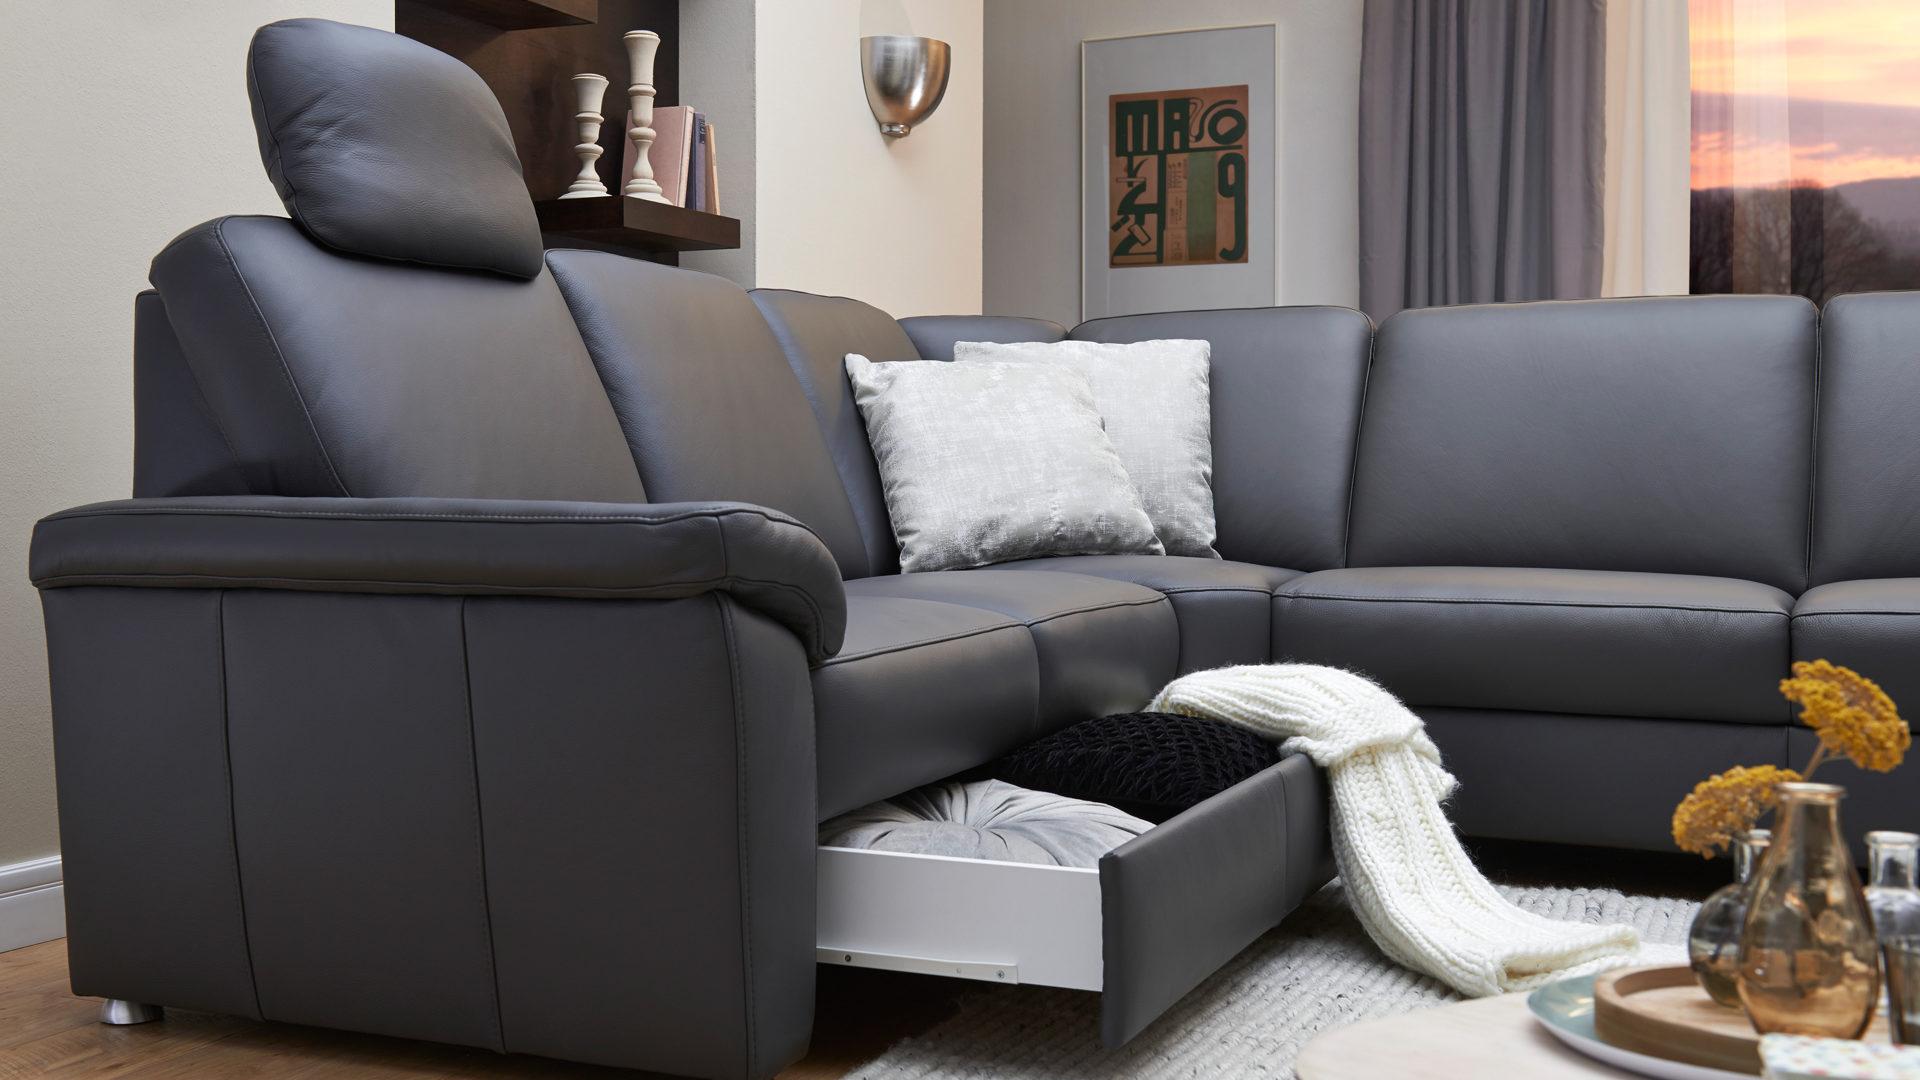 Anthrazit Couch Wohnzimmer Farbe. Affordable Billig Wandfarben ...